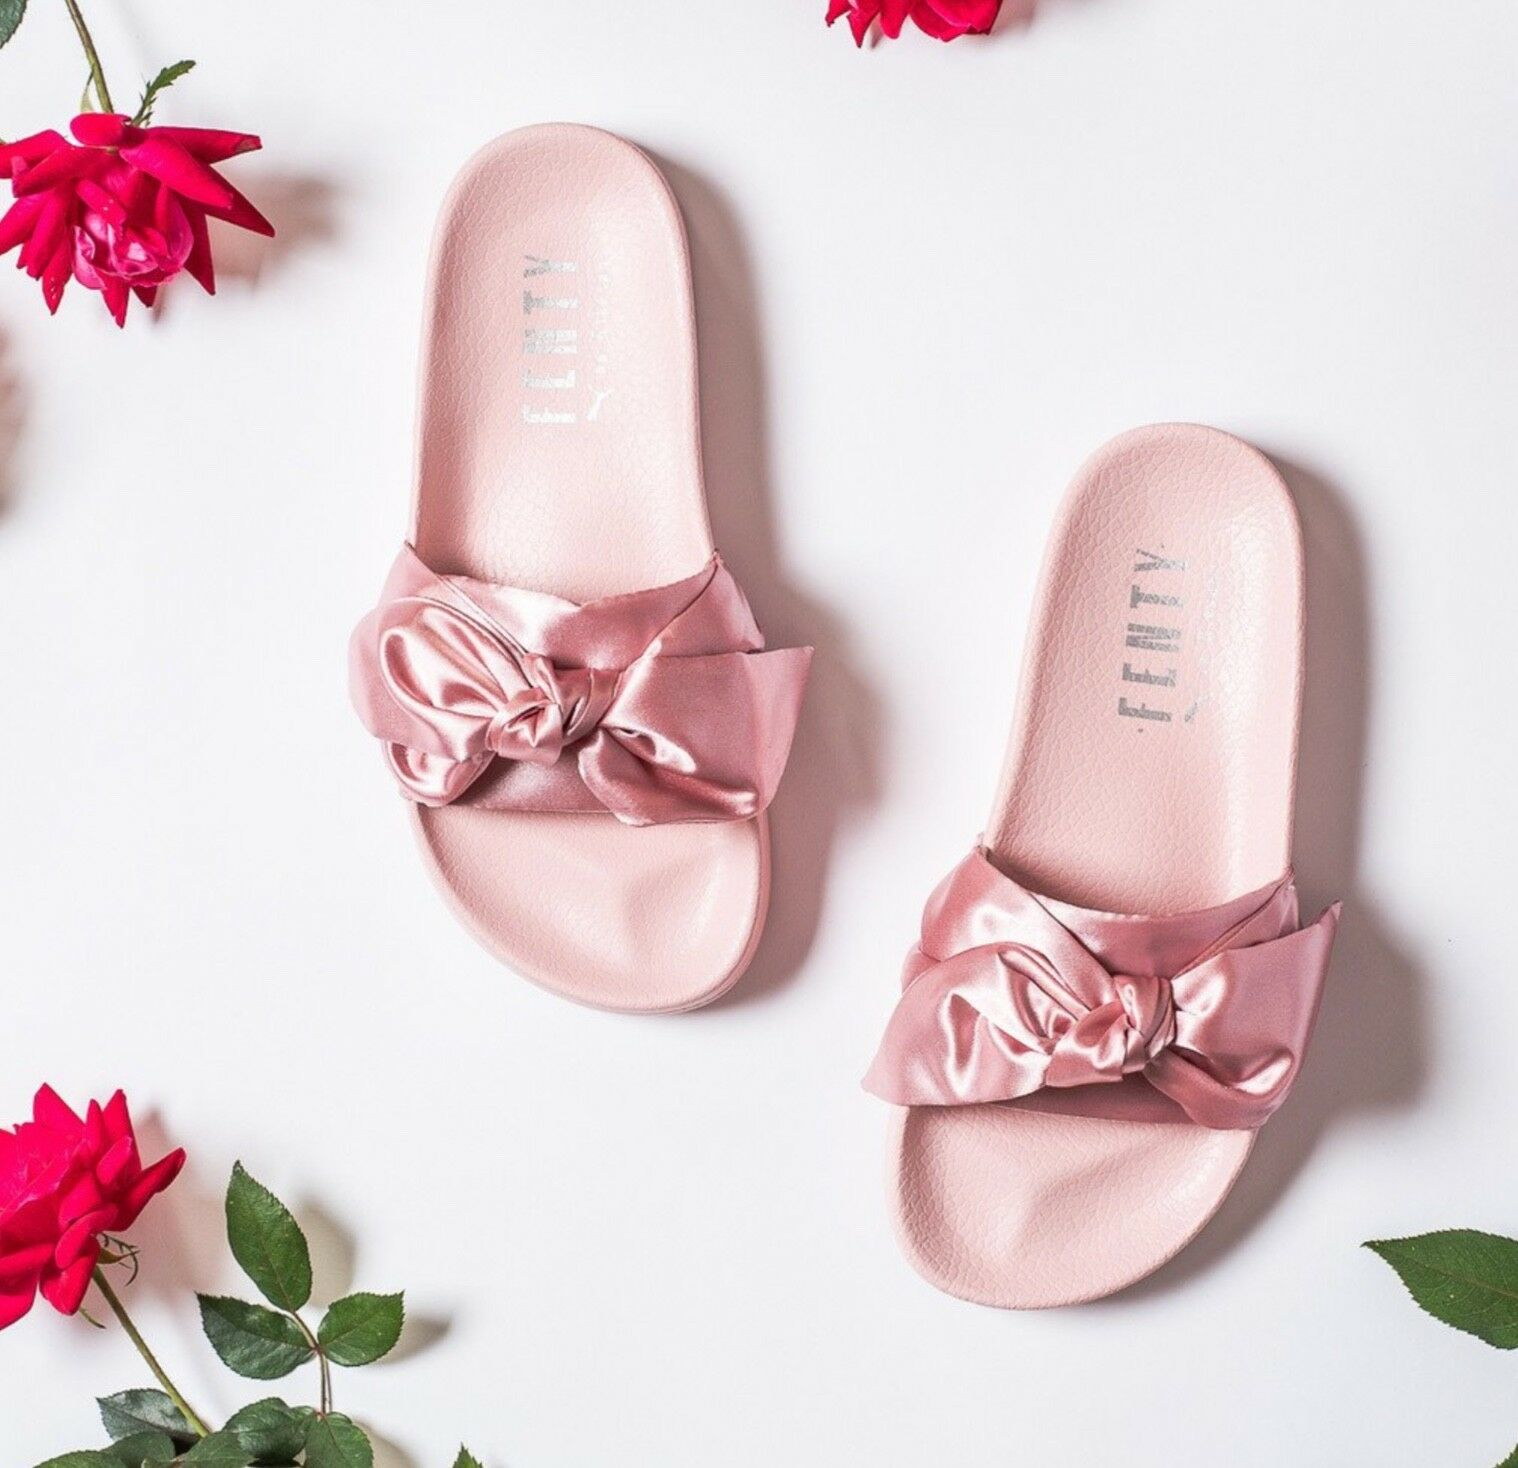 New with Box! The Rihanna x Puma Women's Fenty Bow Slide Sandals Women's Puma Size US6.5 Pink 05c713